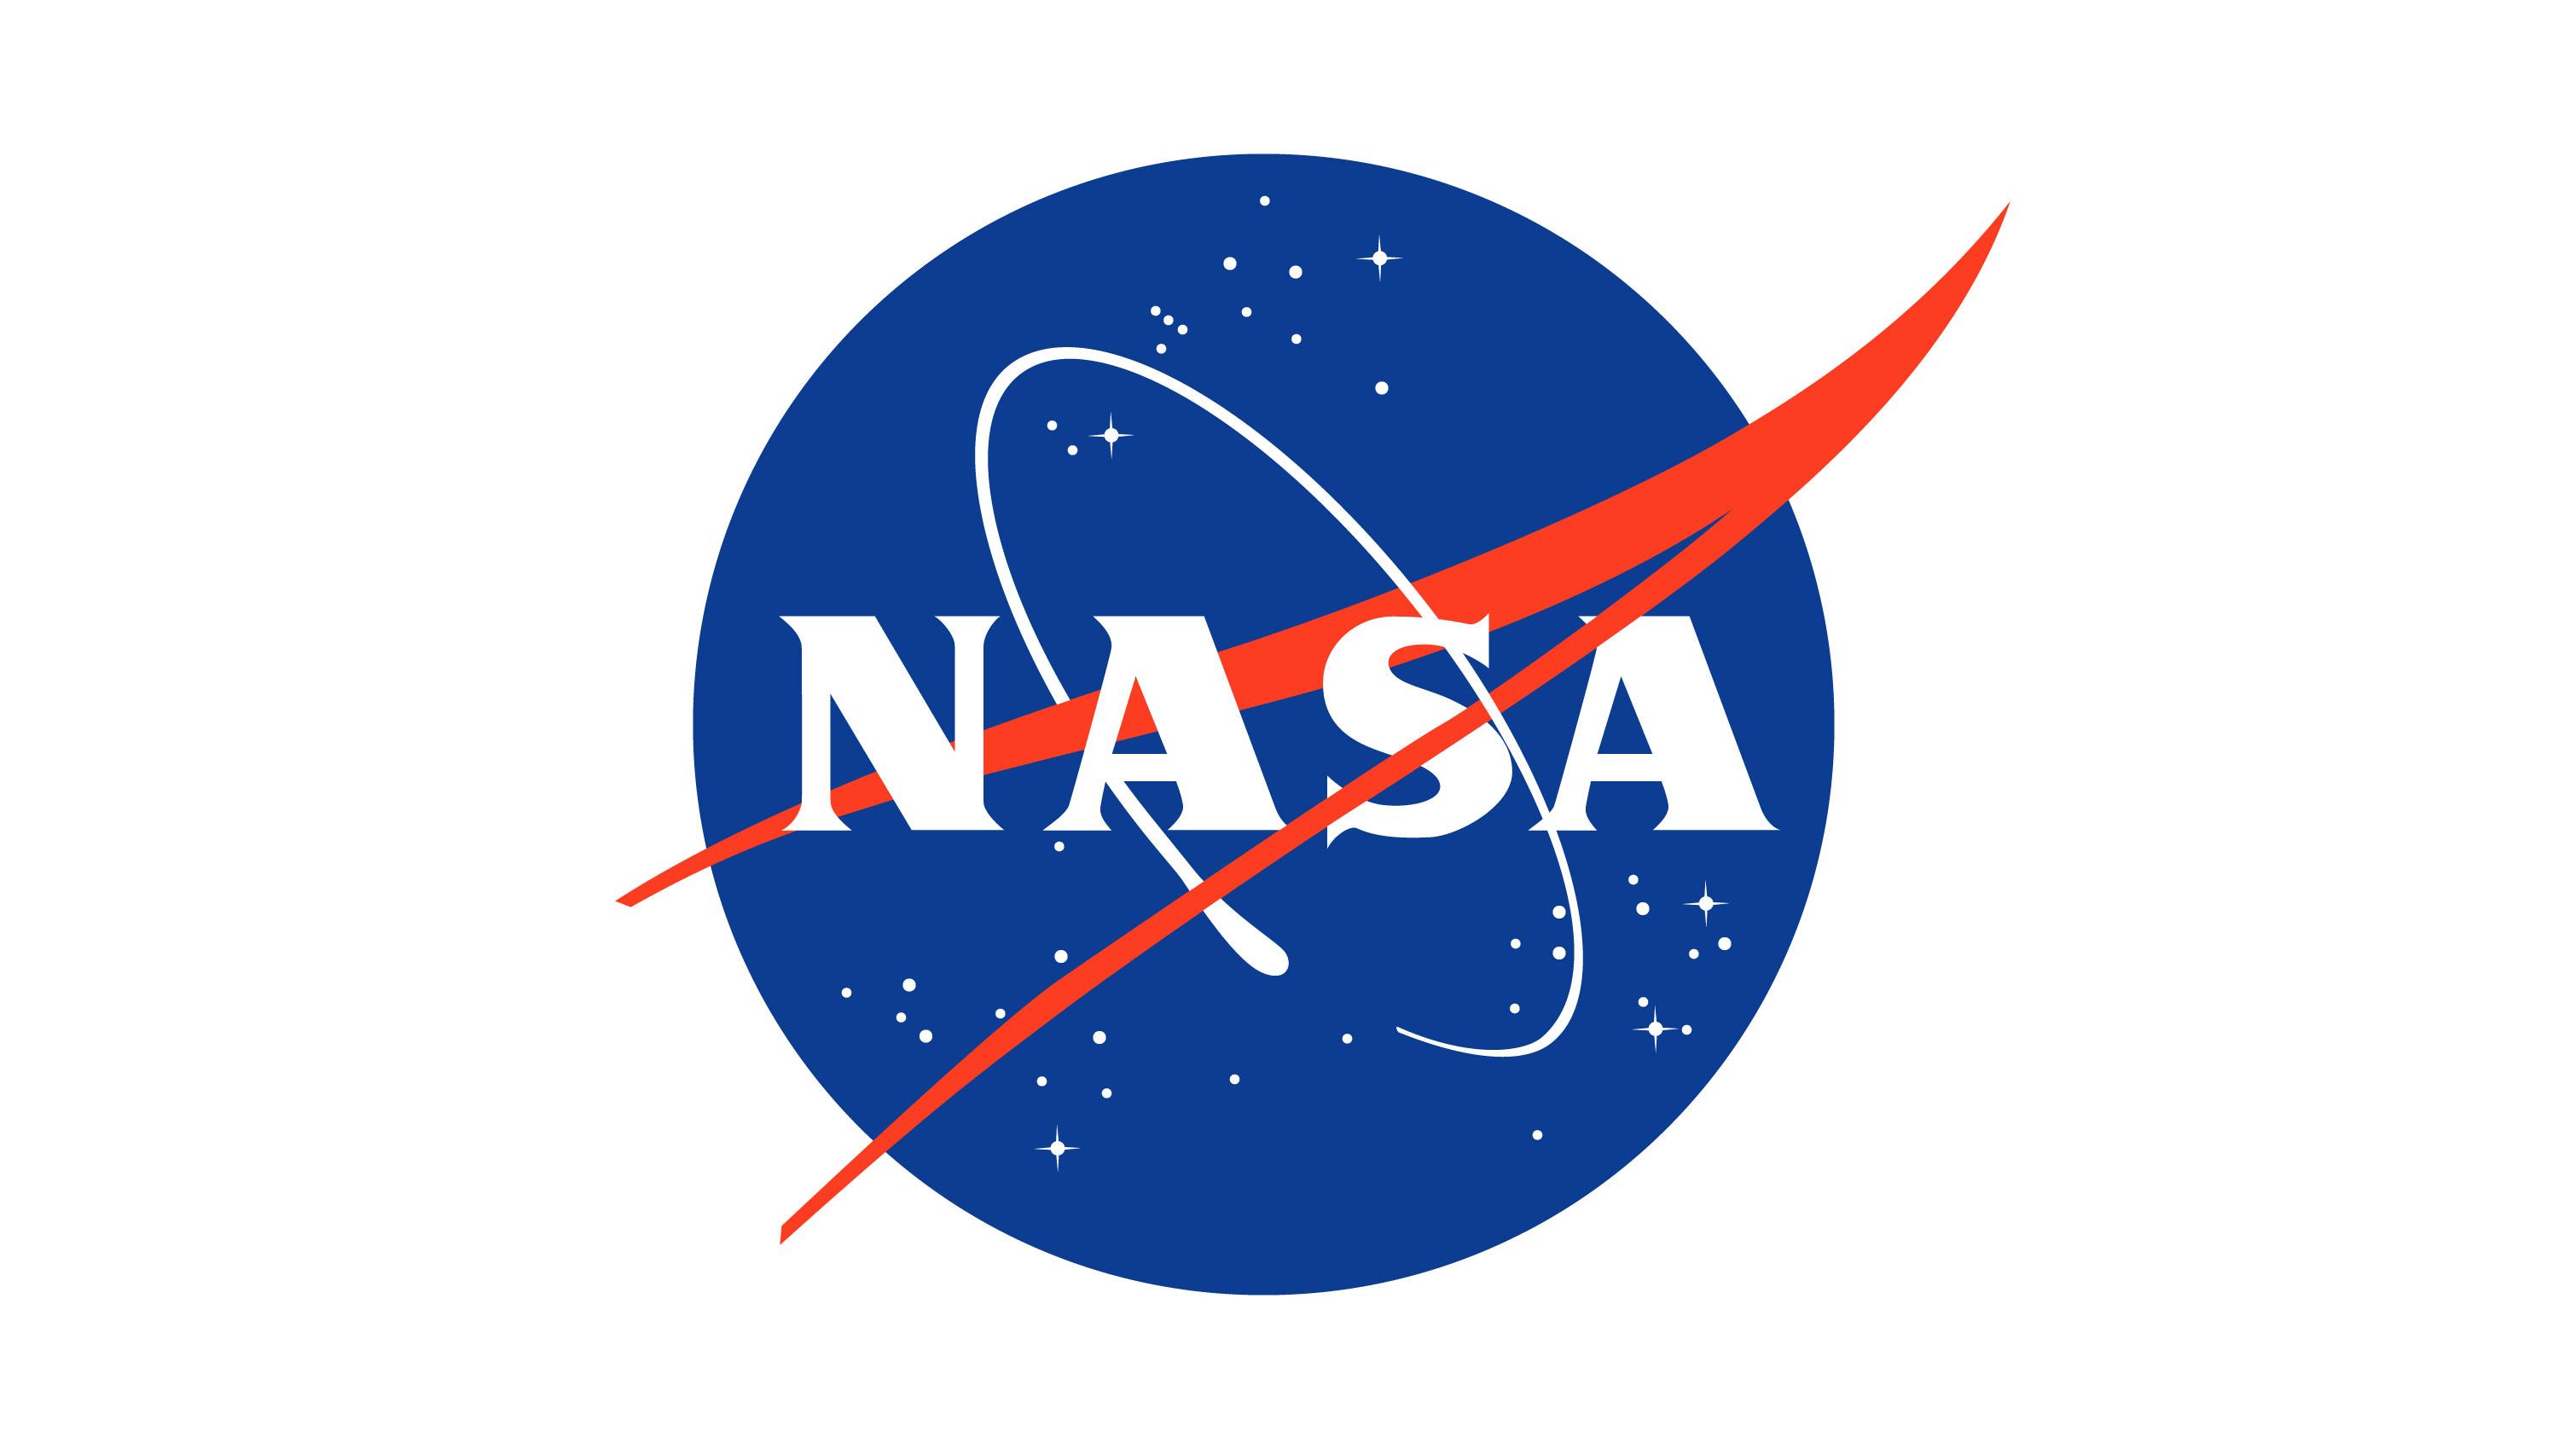 NASA logo: the meatball vs the worm | The Blog Pros